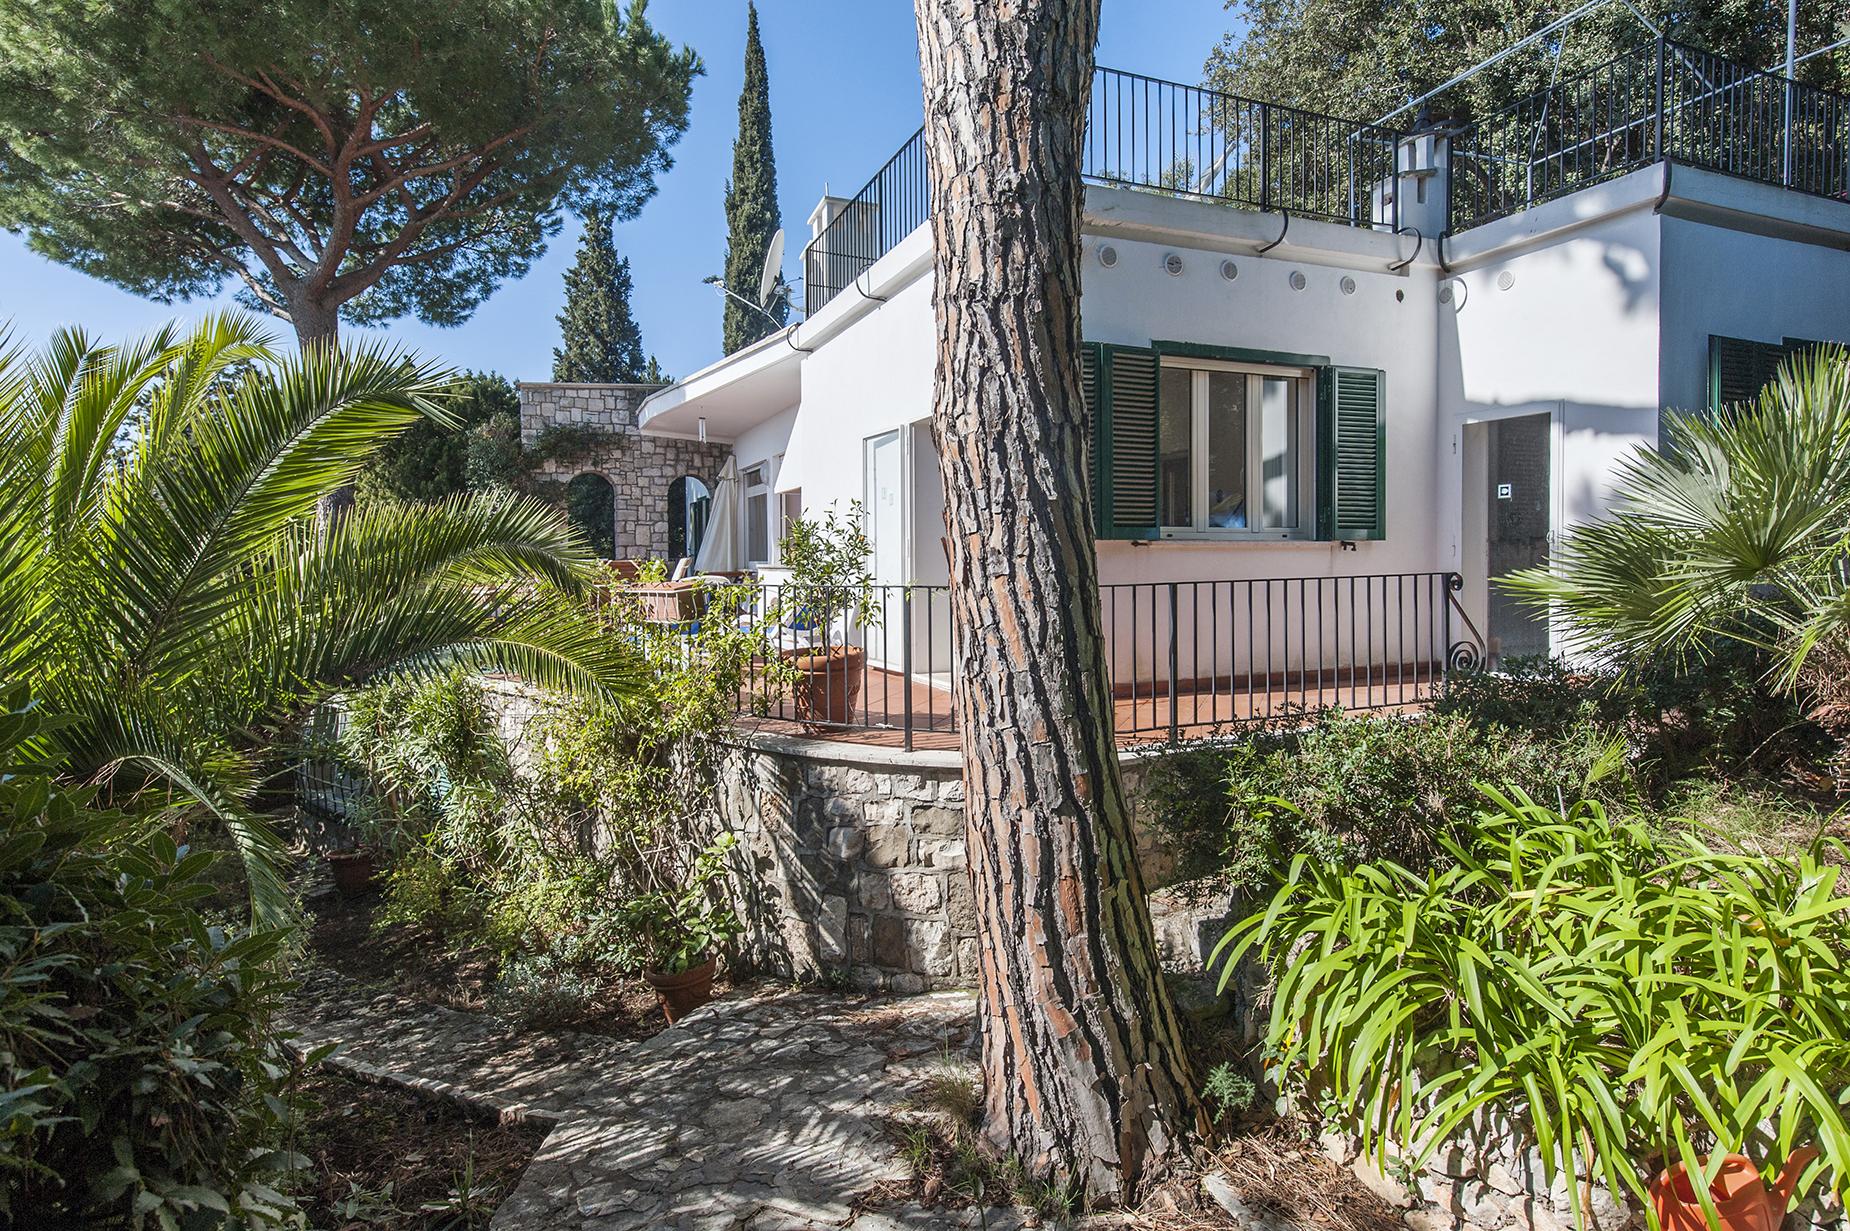 Villa in Vendita a San Felice Circeo via del faro